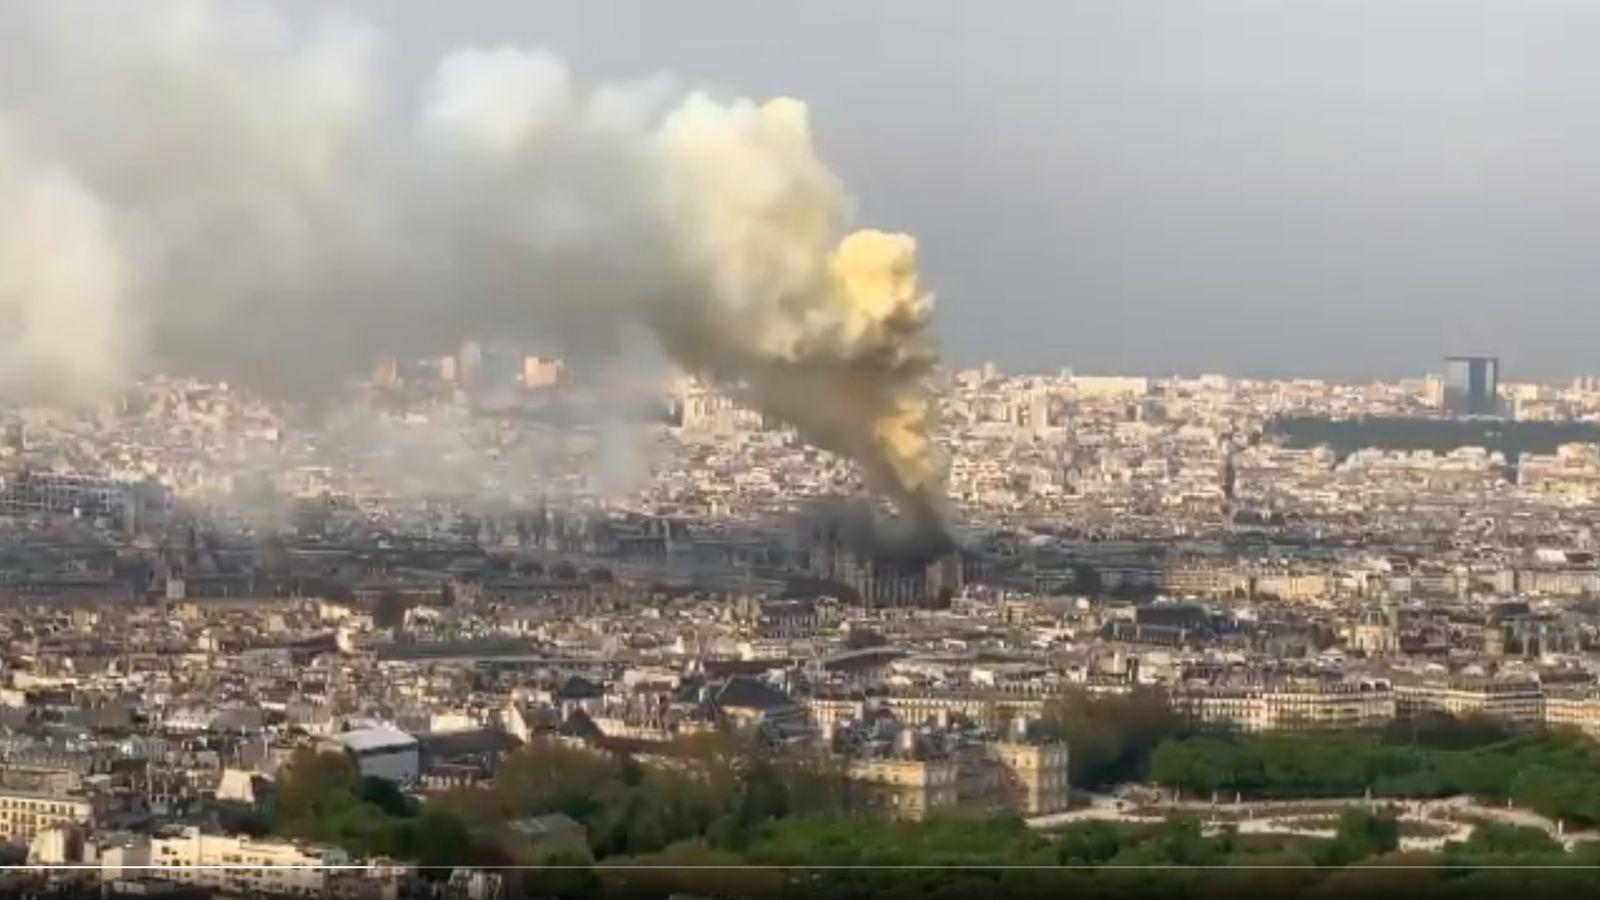 Penampakan Notre Dame yang kebakaran